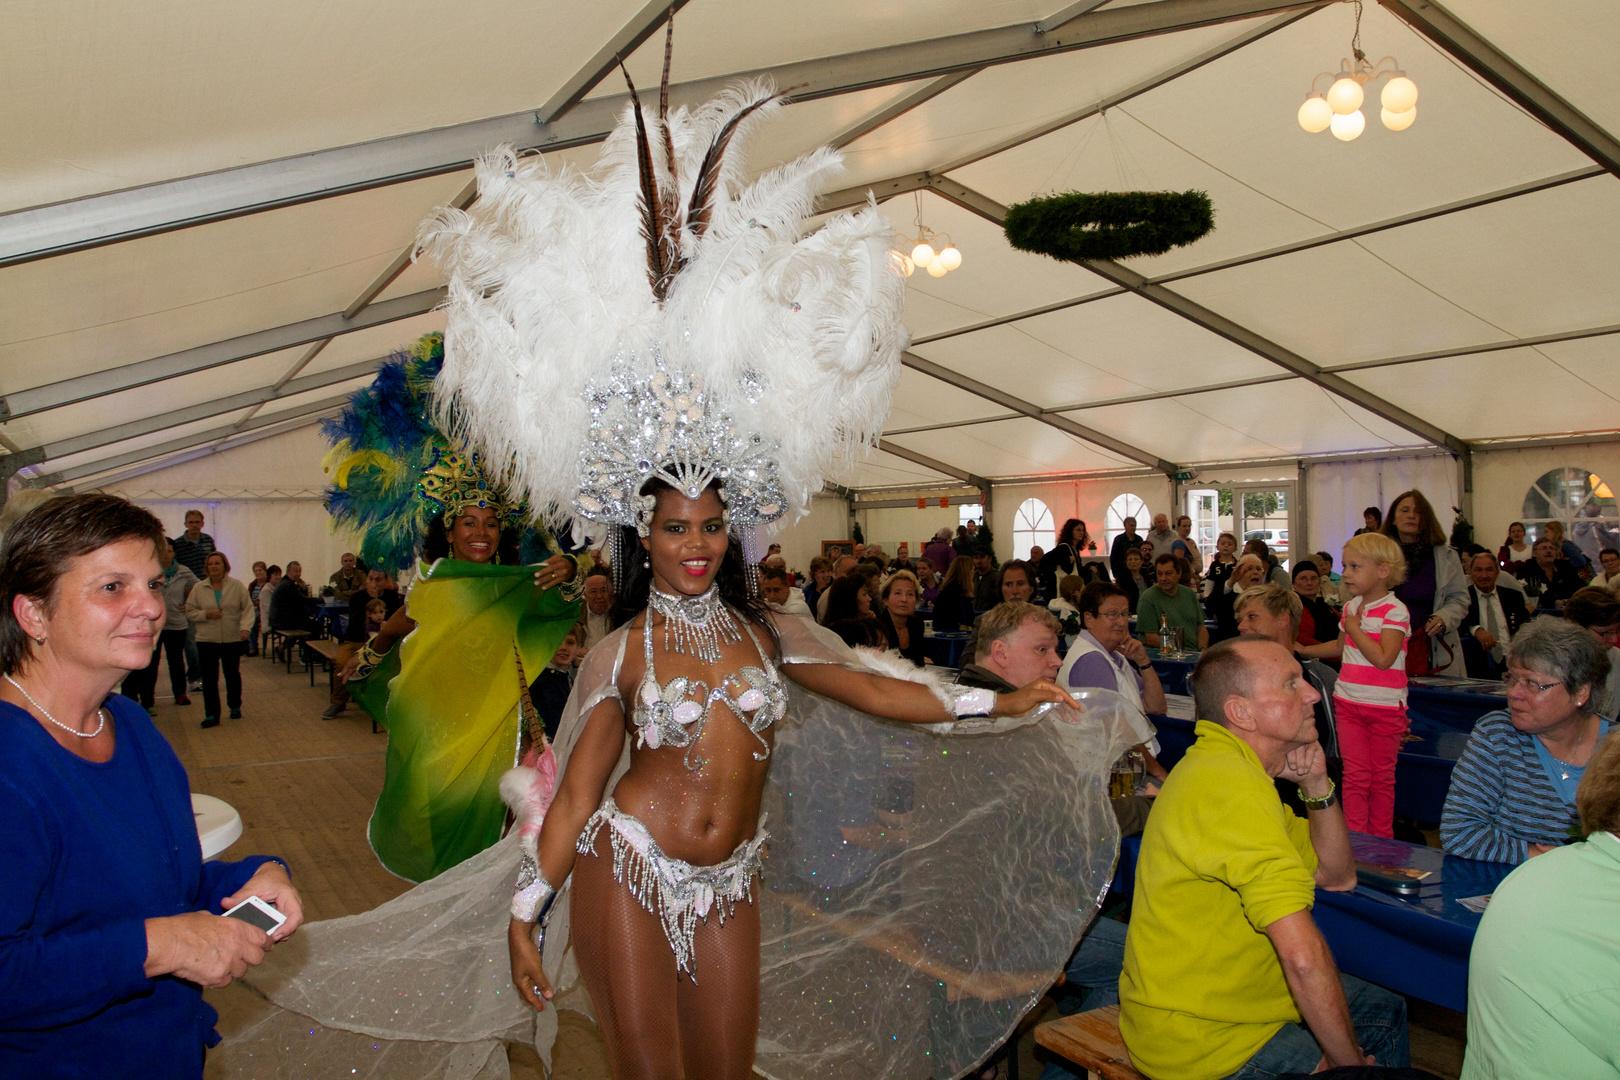 Copacabana-Sambashow Nr. 4616